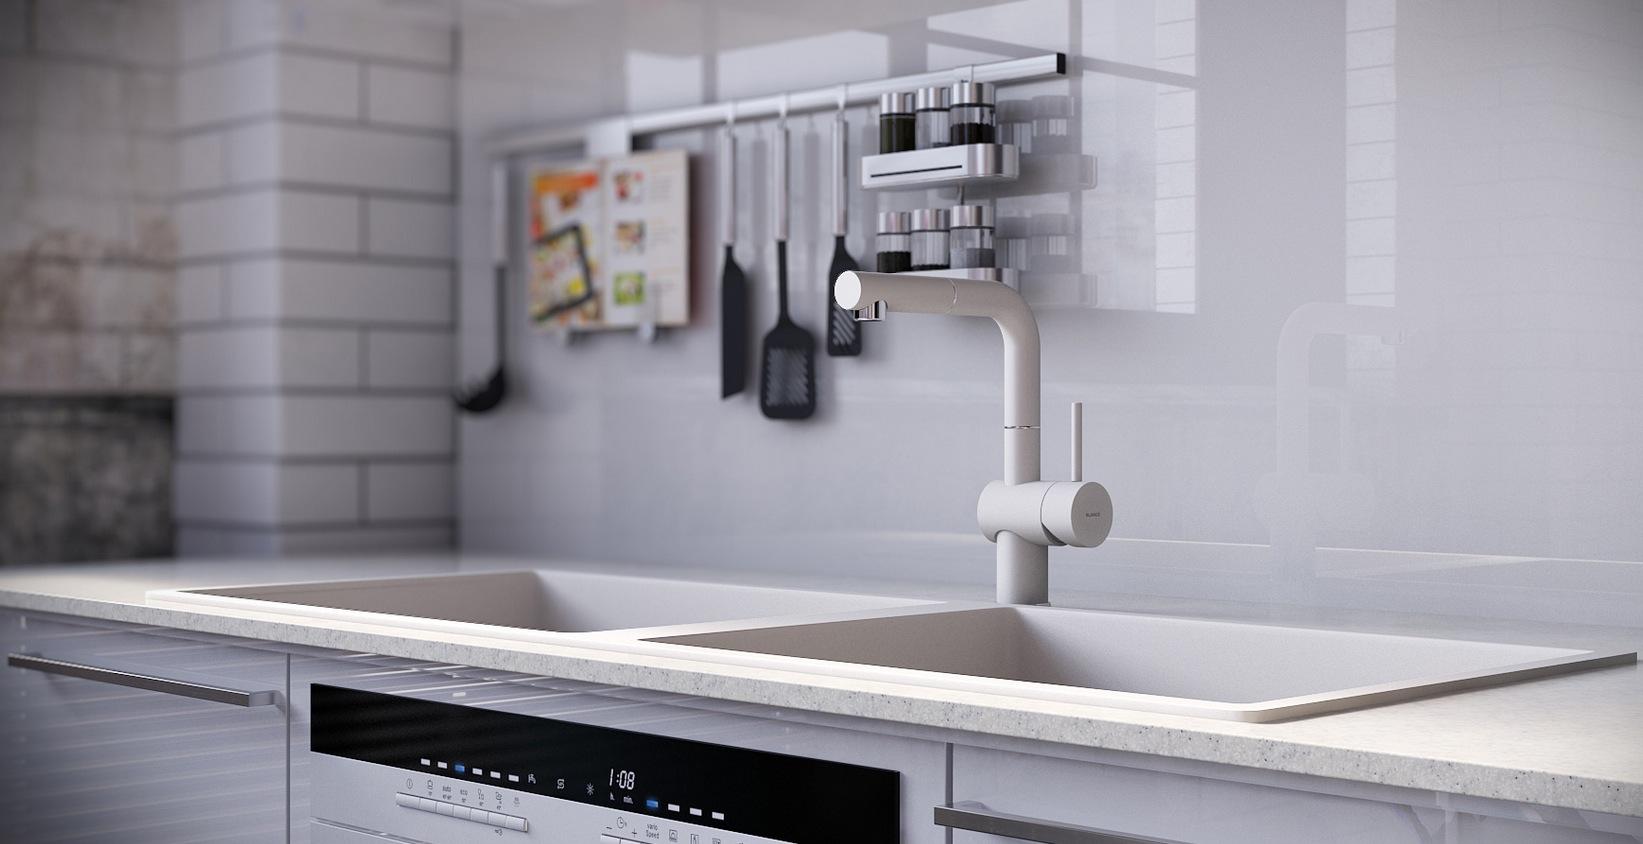 RIP3D Industrial Loft High Gloss White Kitchen Island Splash Back Interior Design Ideas